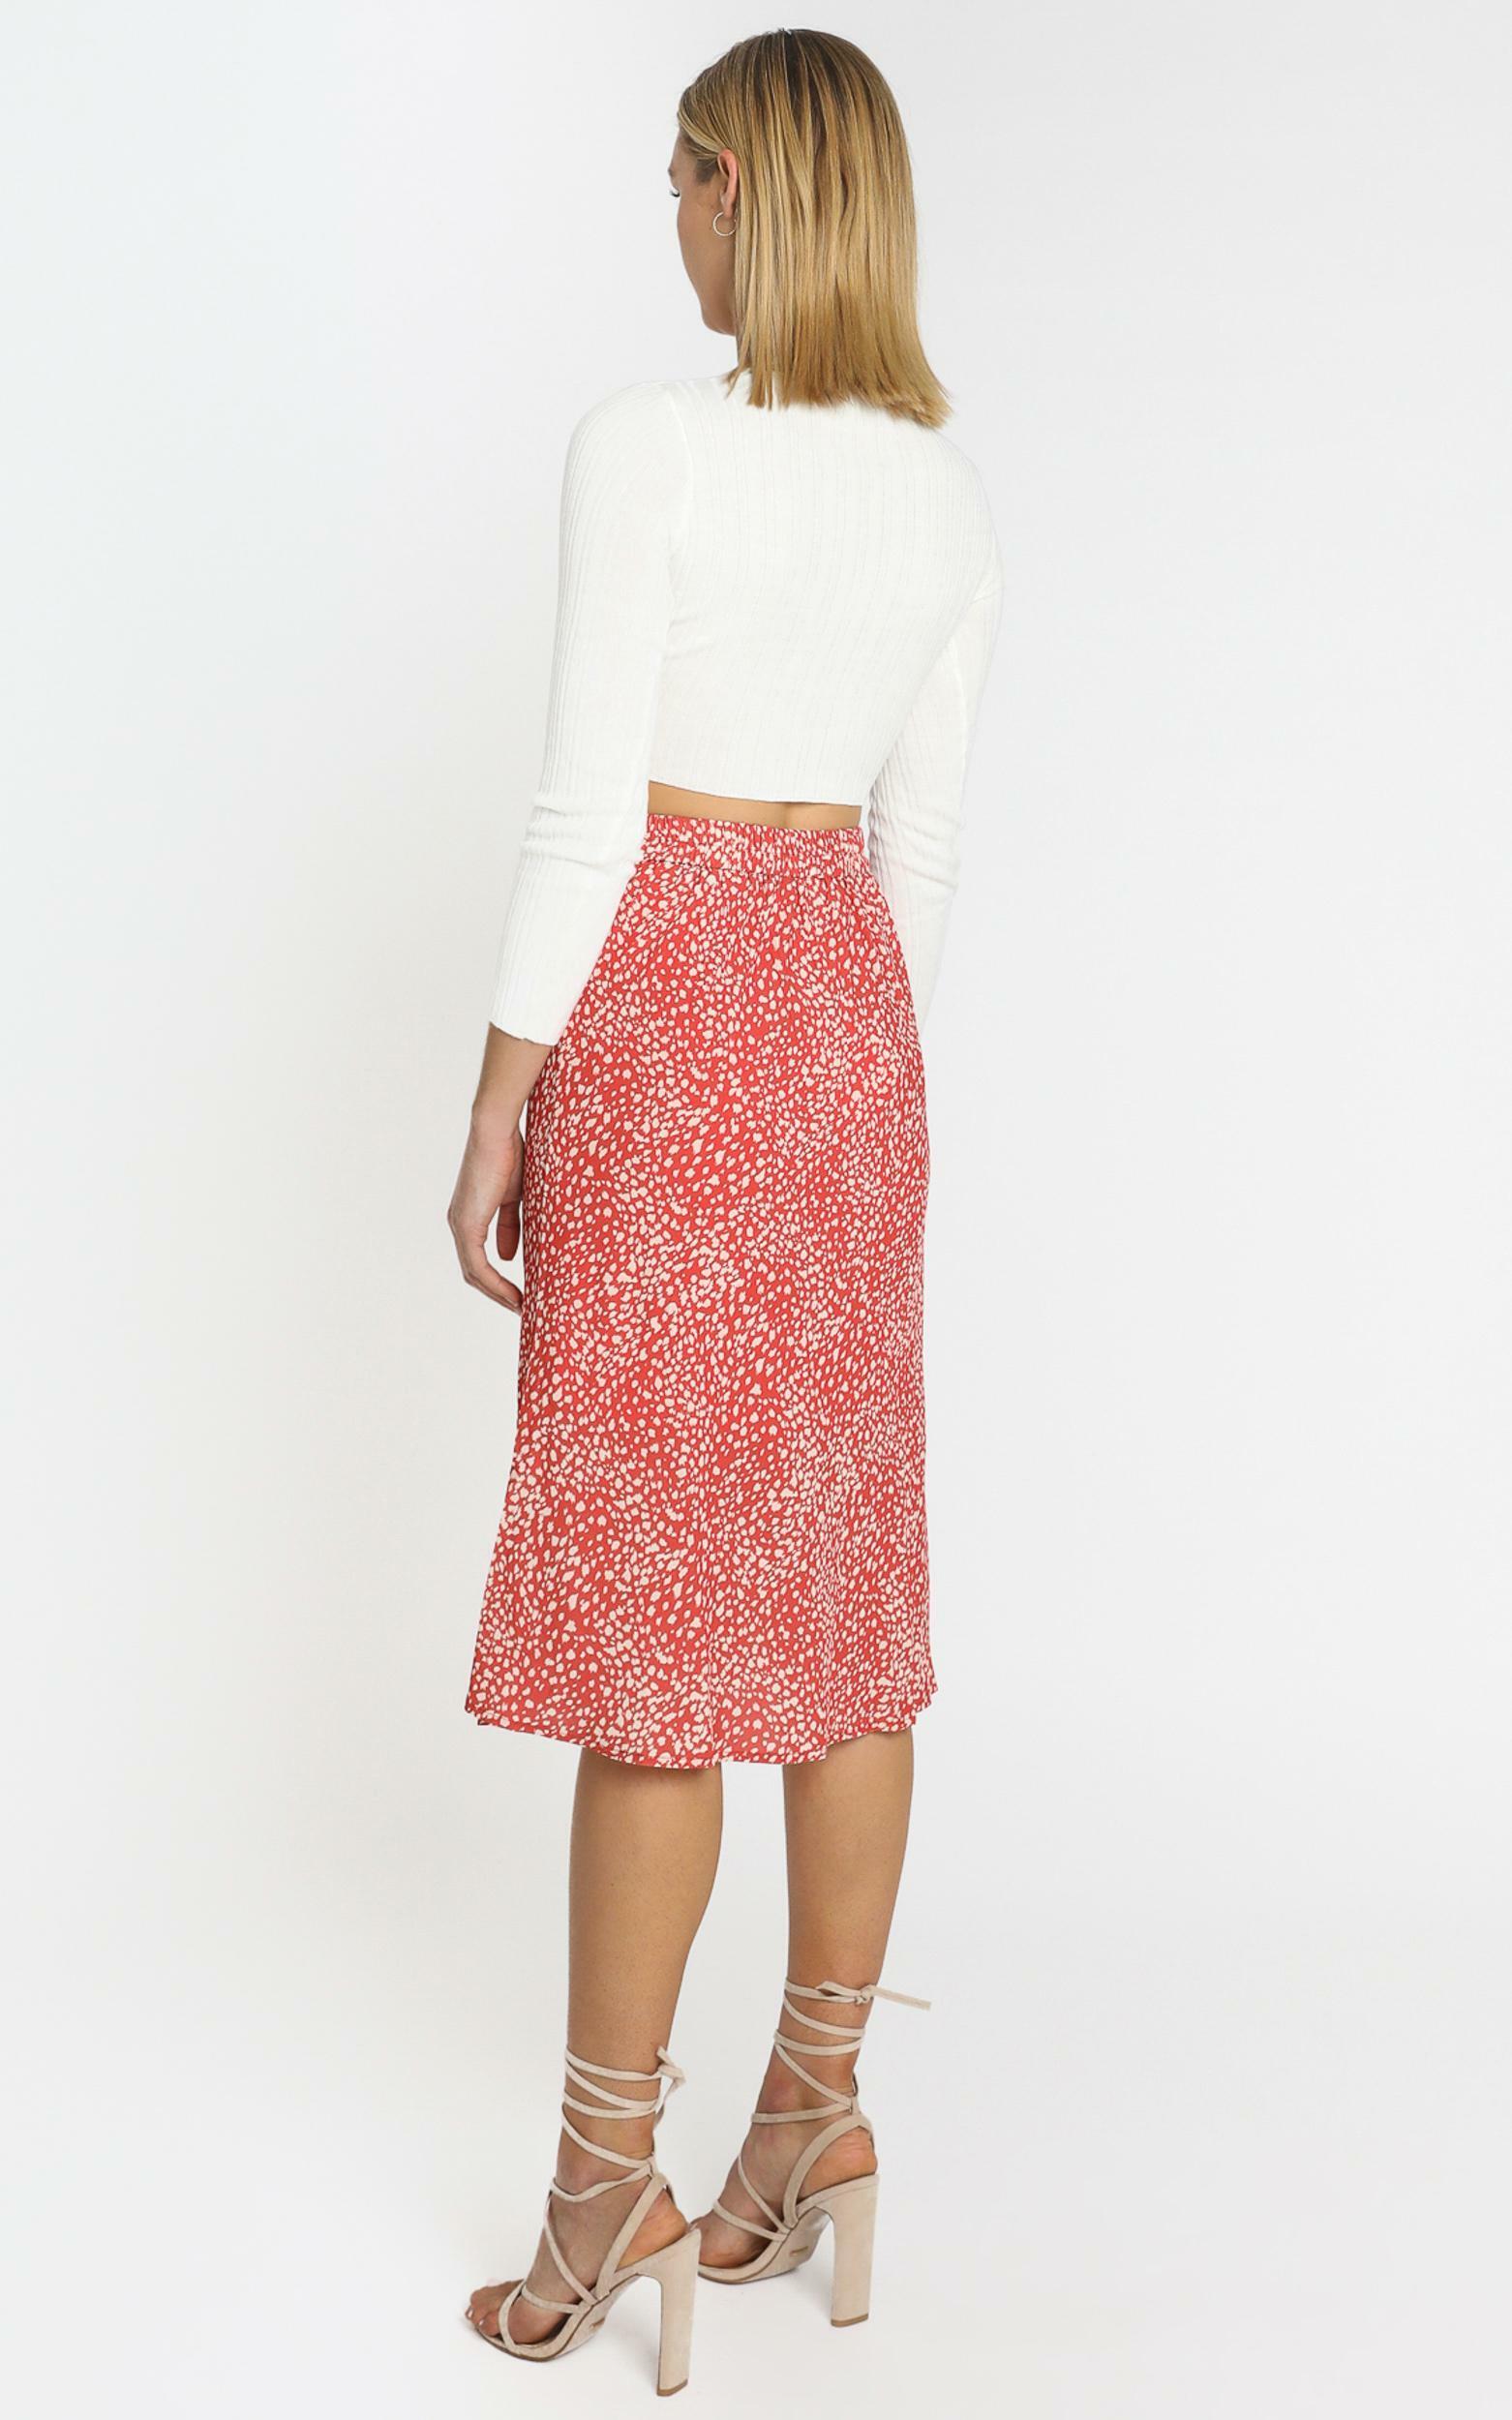 Alegra Skirt in Orange - 6 (XS), ORG1, hi-res image number null